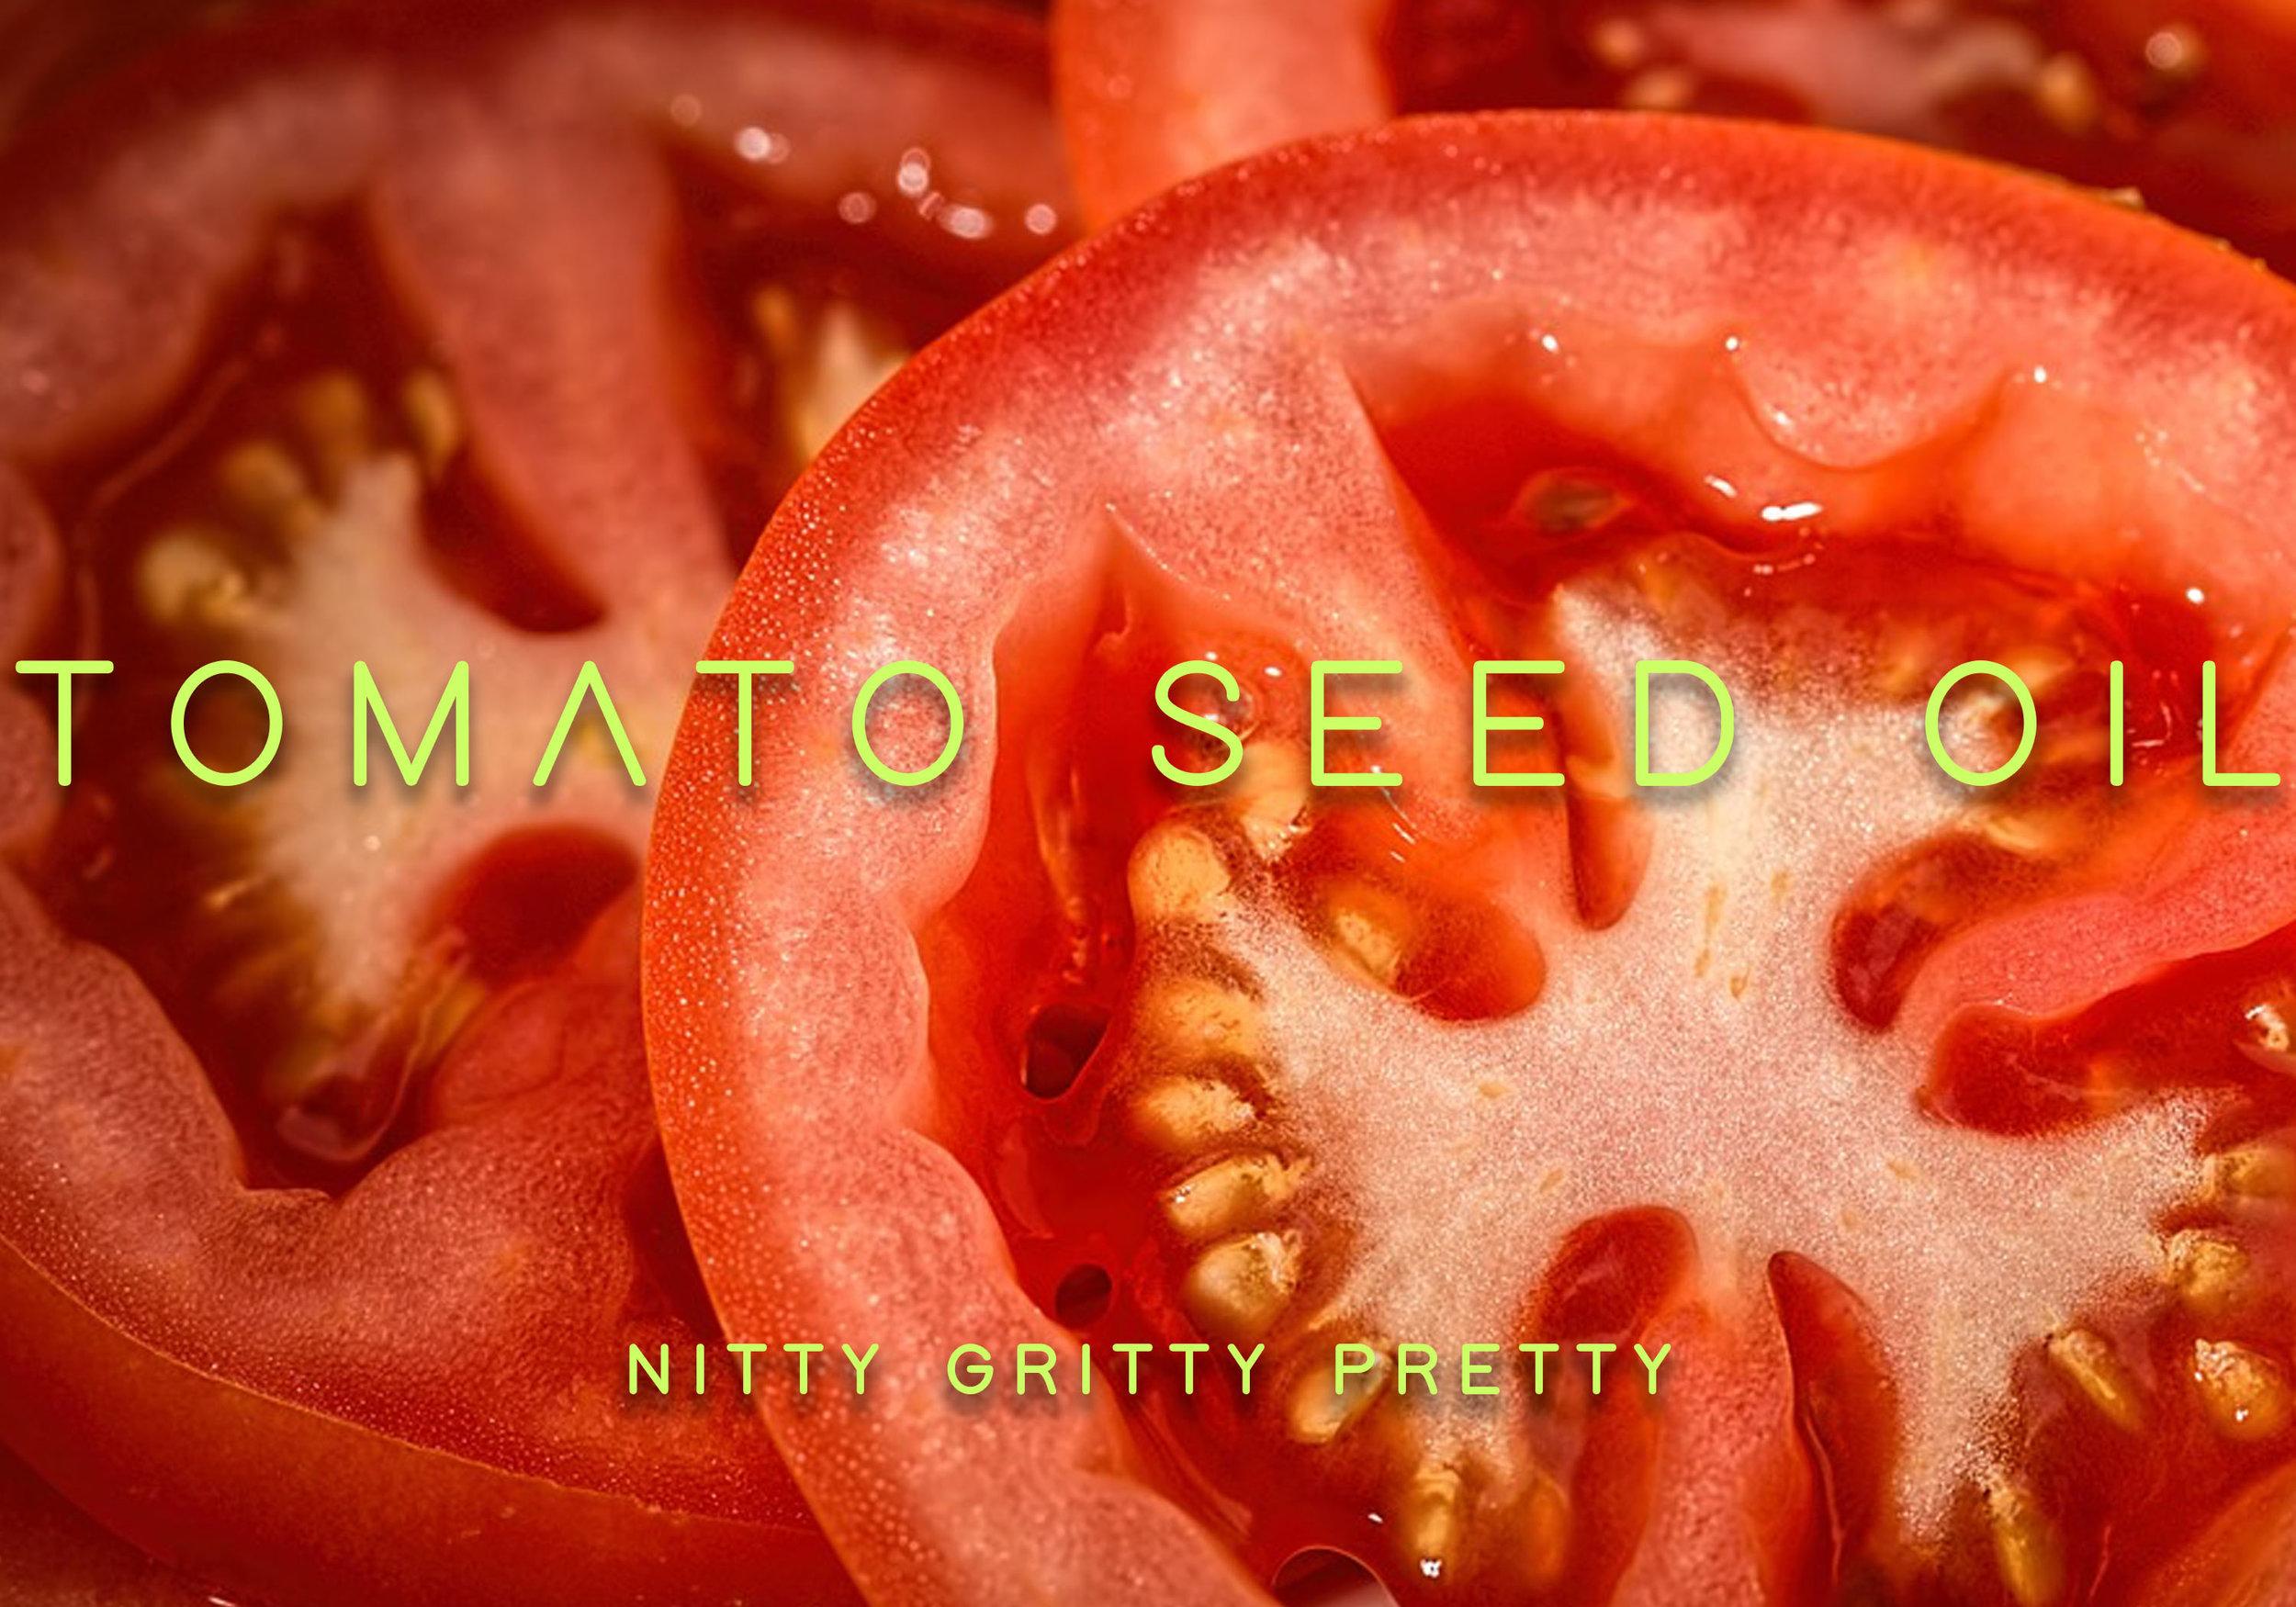 tomato seed oil.jpg